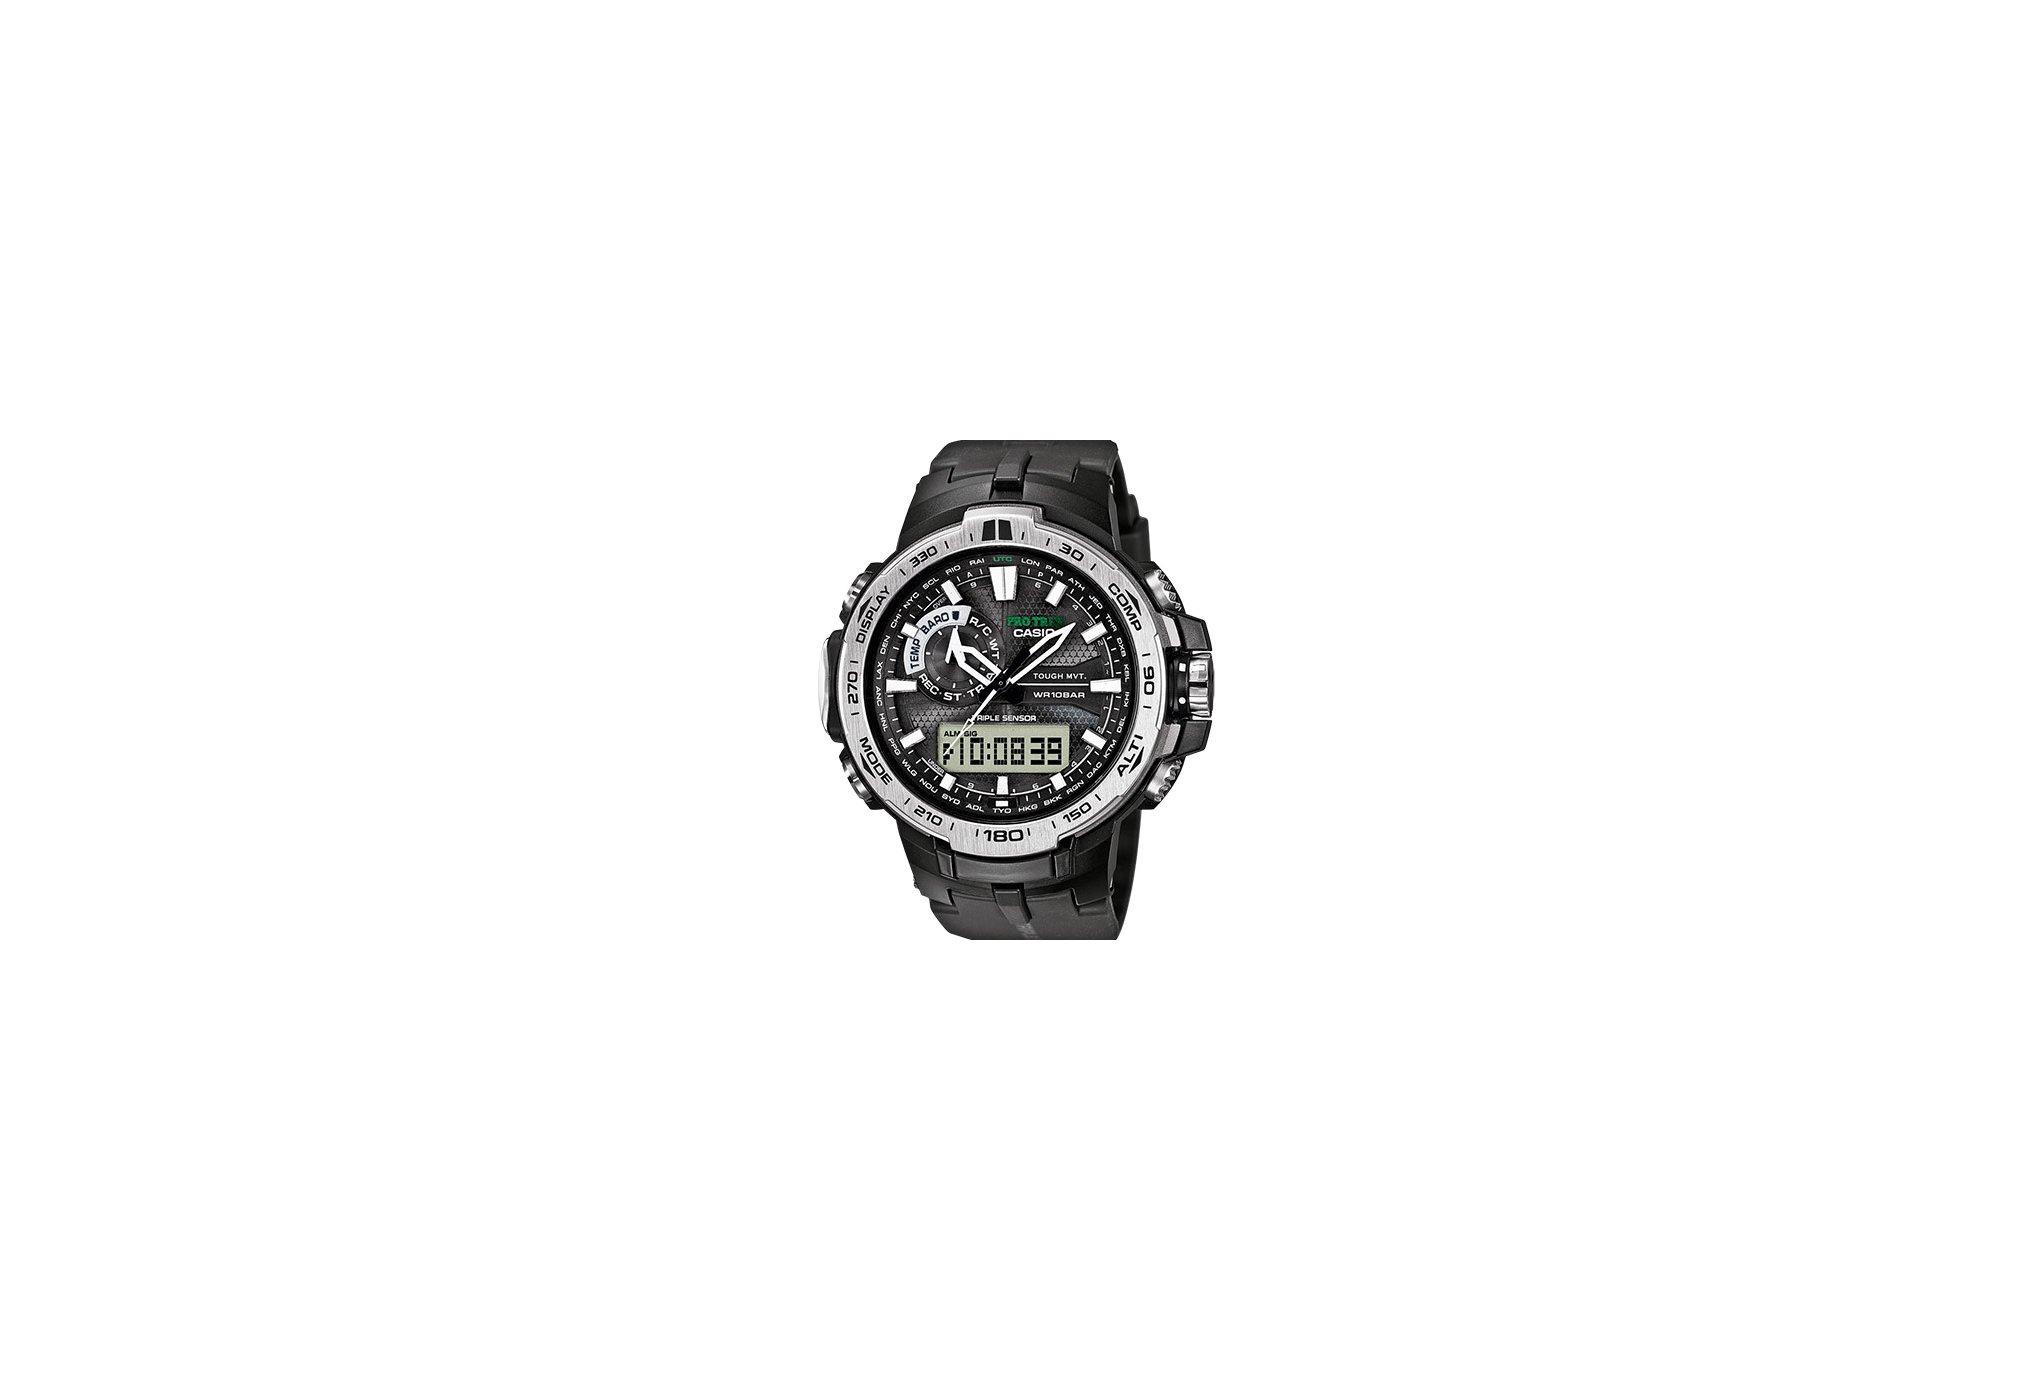 Casio Pro trek prw-6000 montres de sport